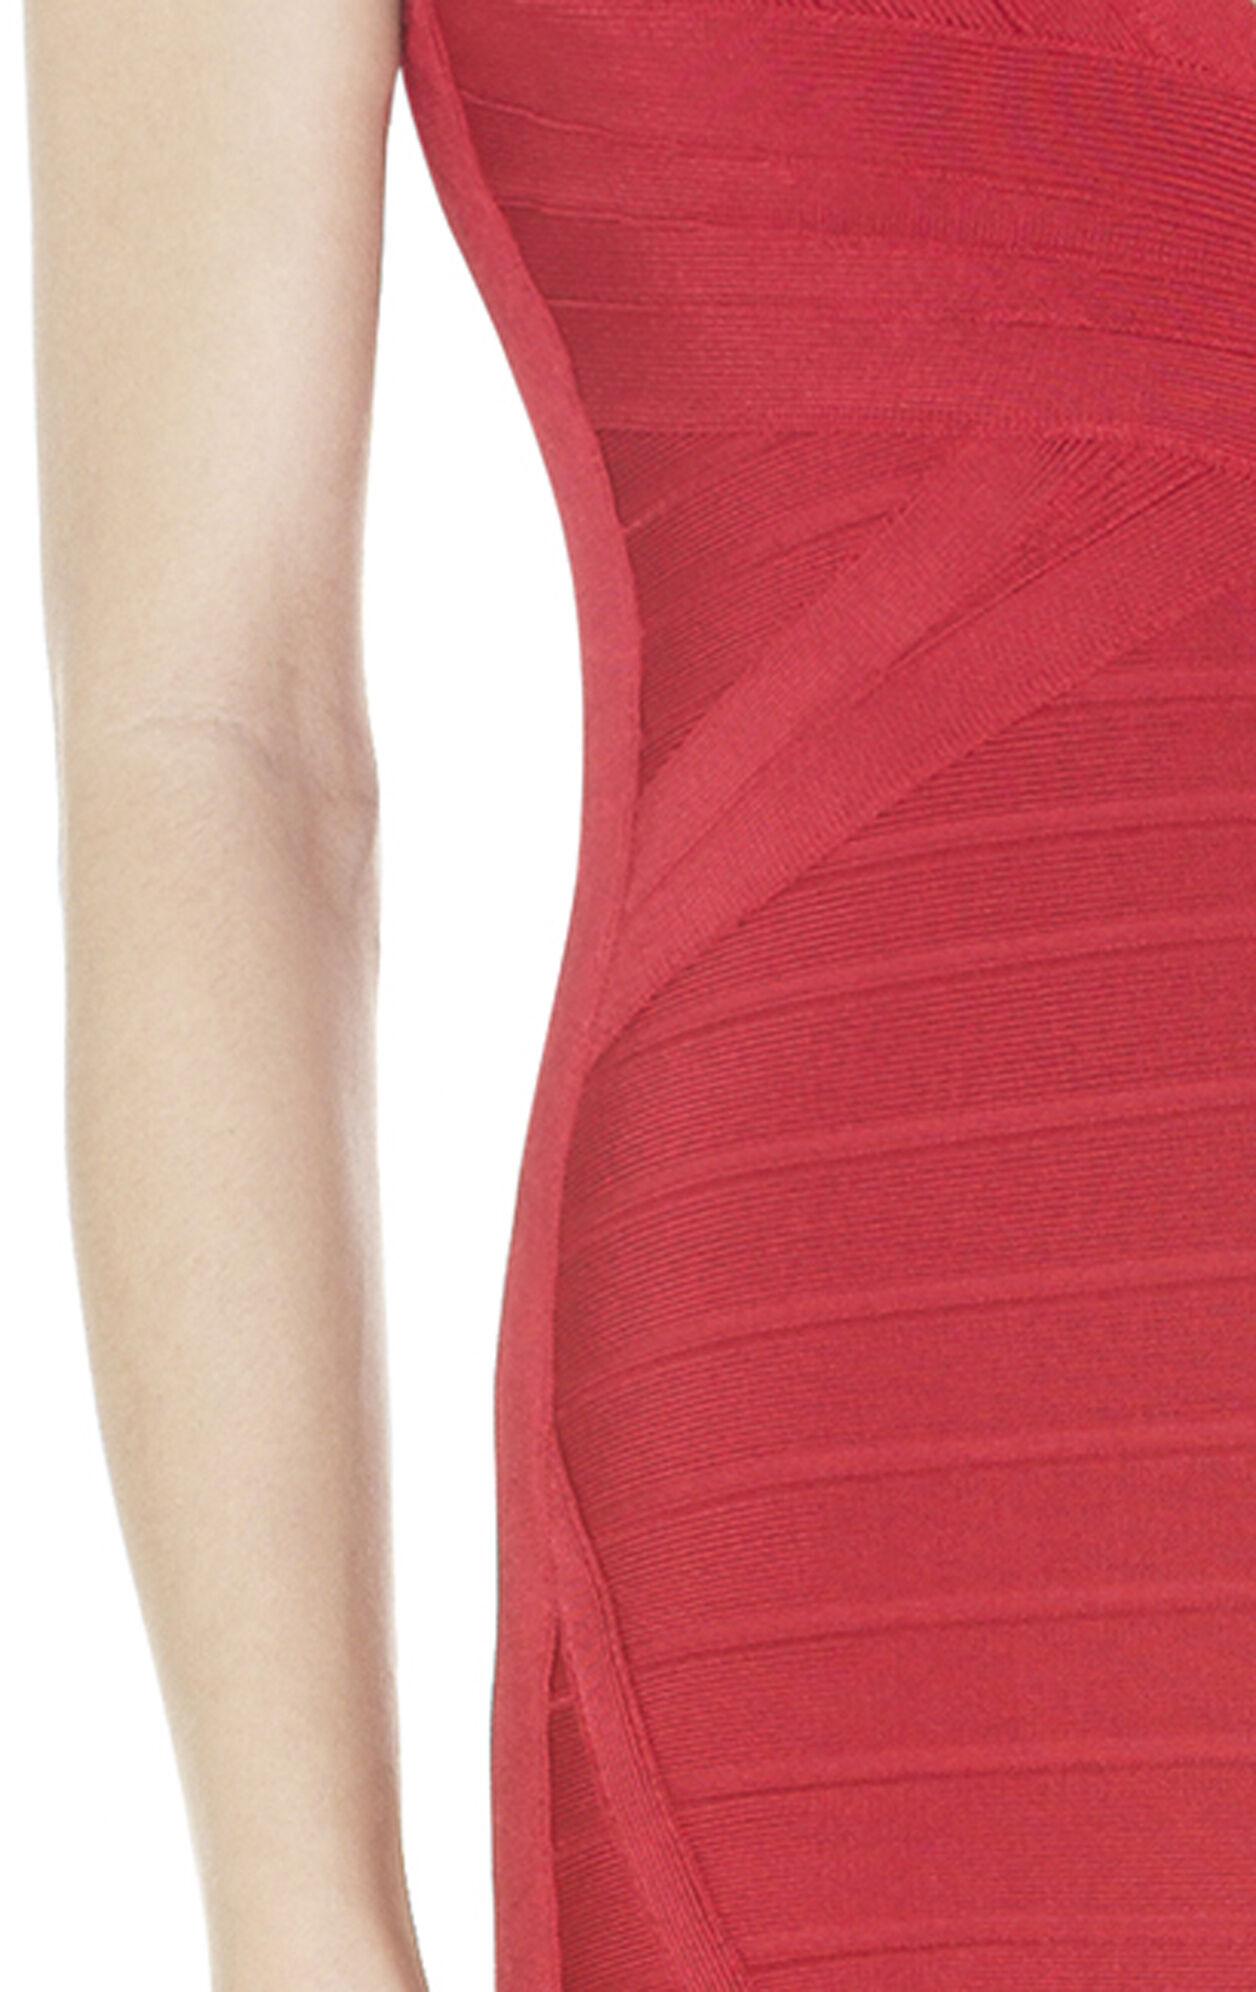 Katya Signature Bandage Dress